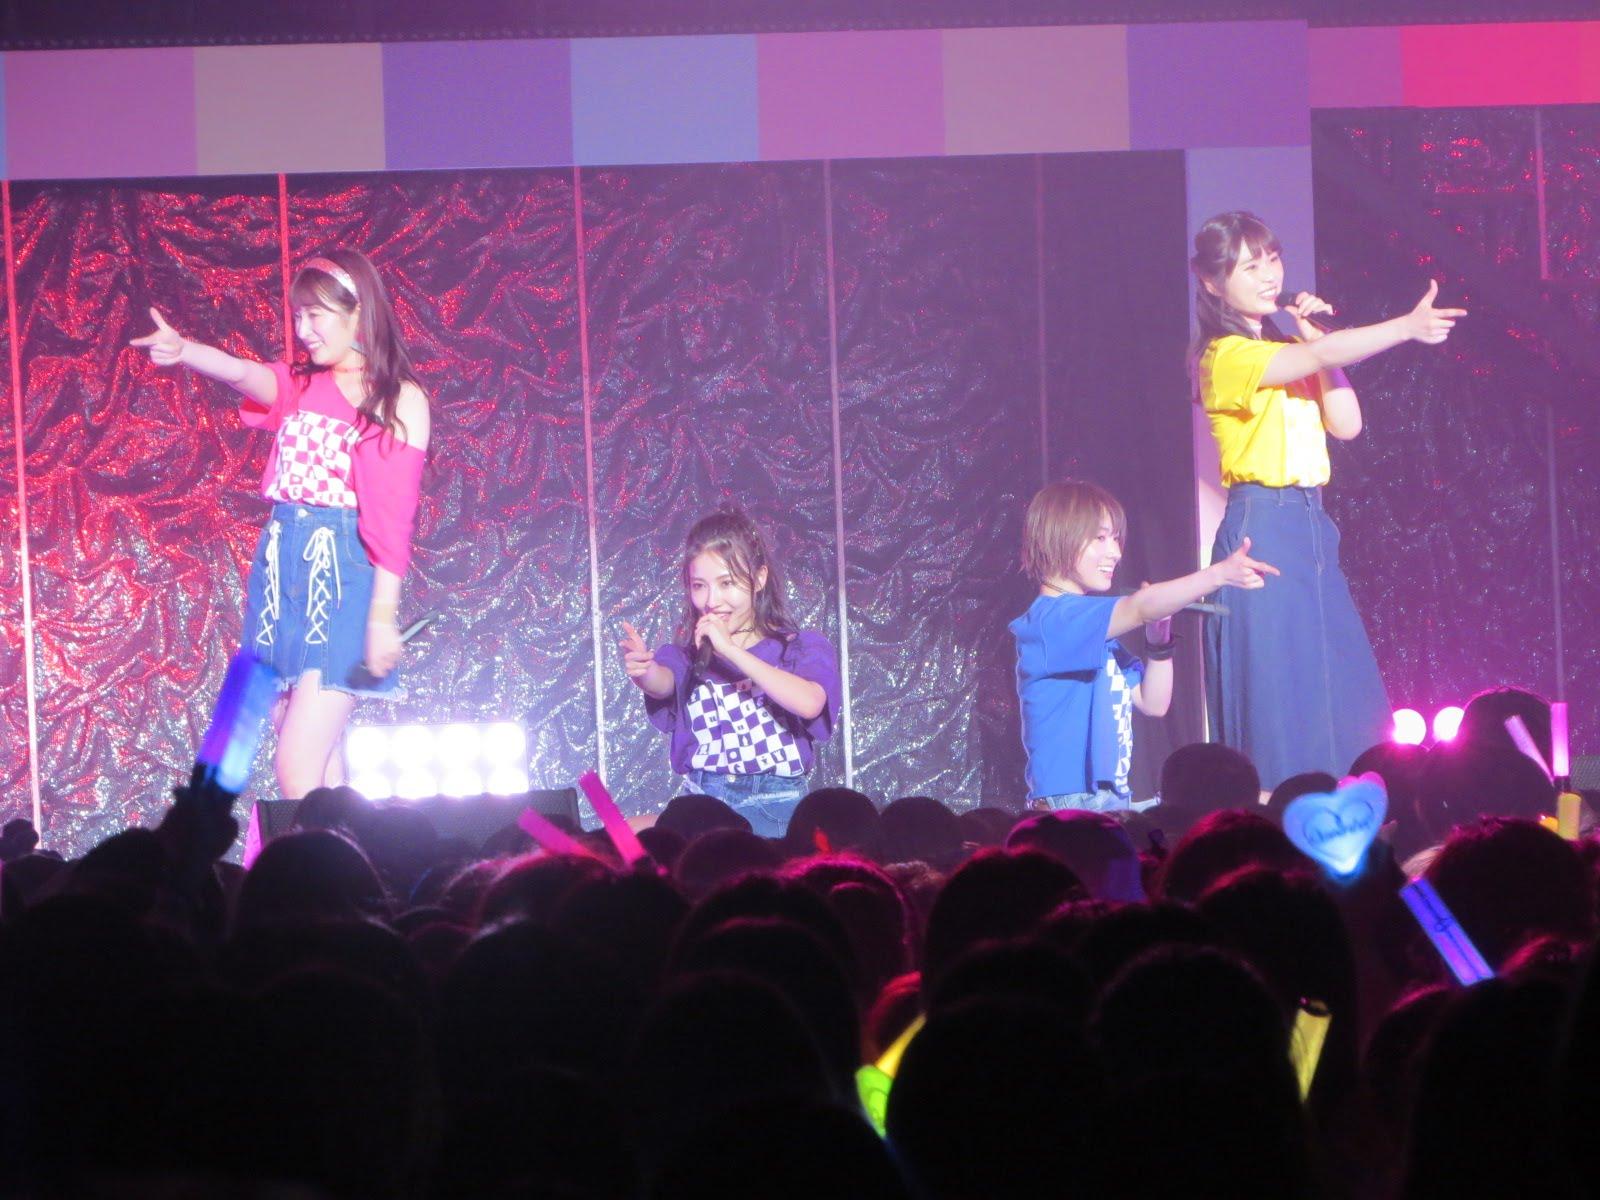 【NMB48】Queentet豊洲PIT公演のグーグルフォト画像とSNSなど。